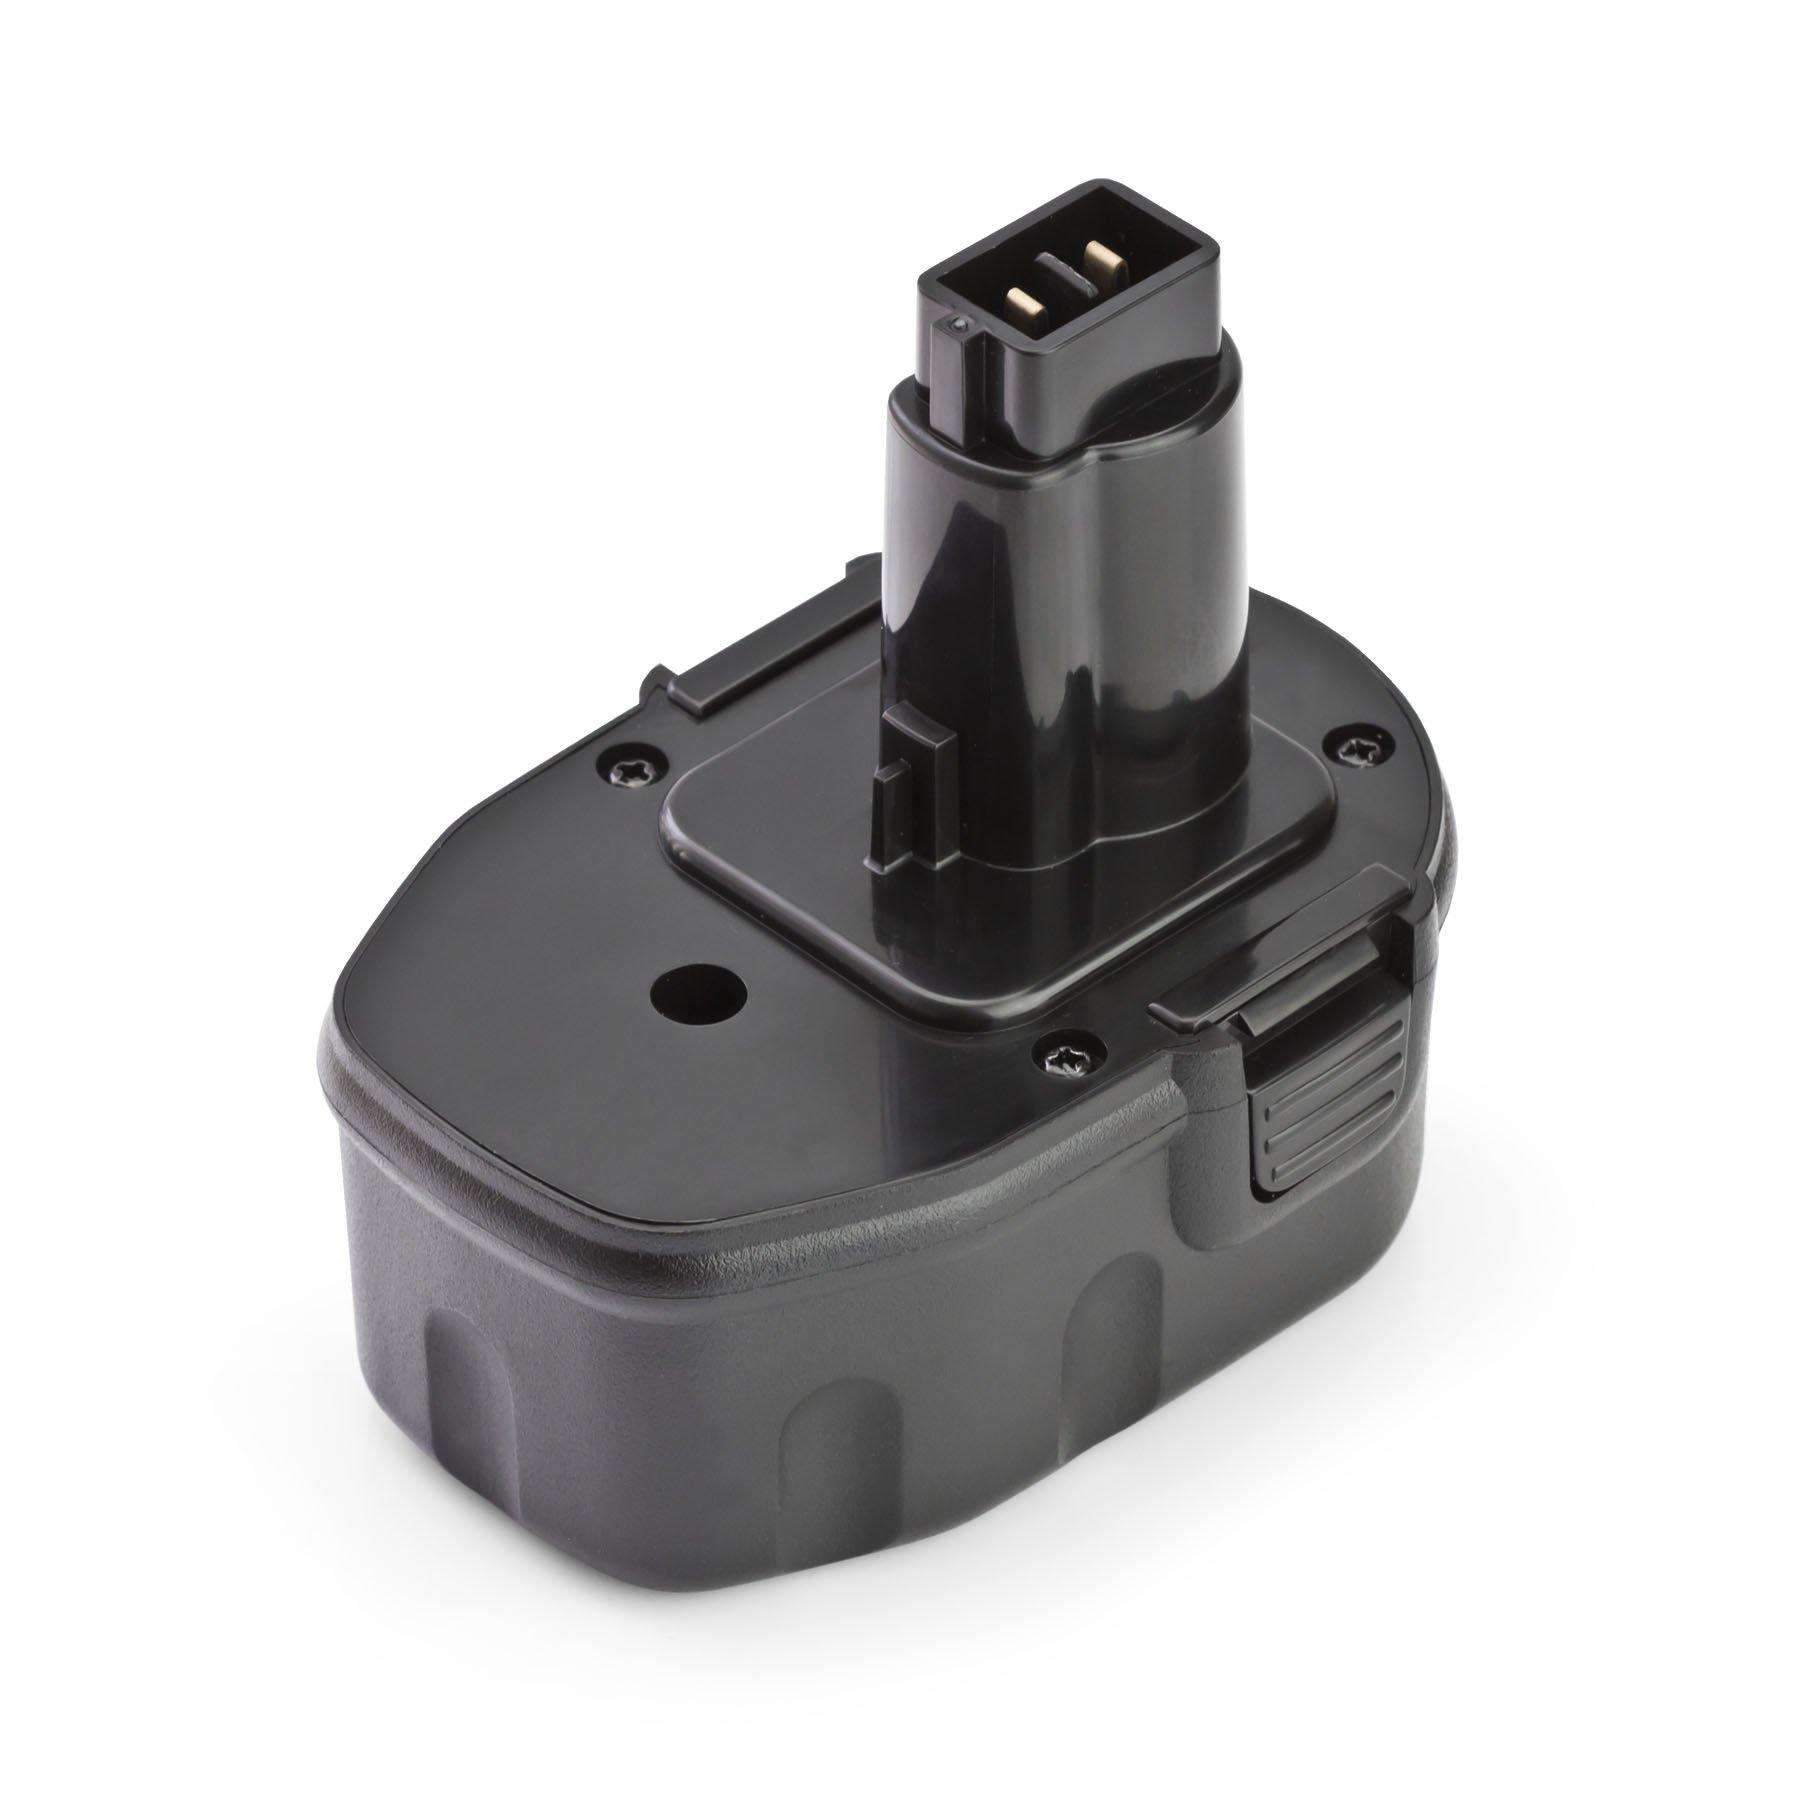 ExpertPower 14.4v 1500mAh NiMh Battery for Dewalt DW9094 DW9091 DC9091 DE9038 DE9091 DE9092 DE9094 DE9502